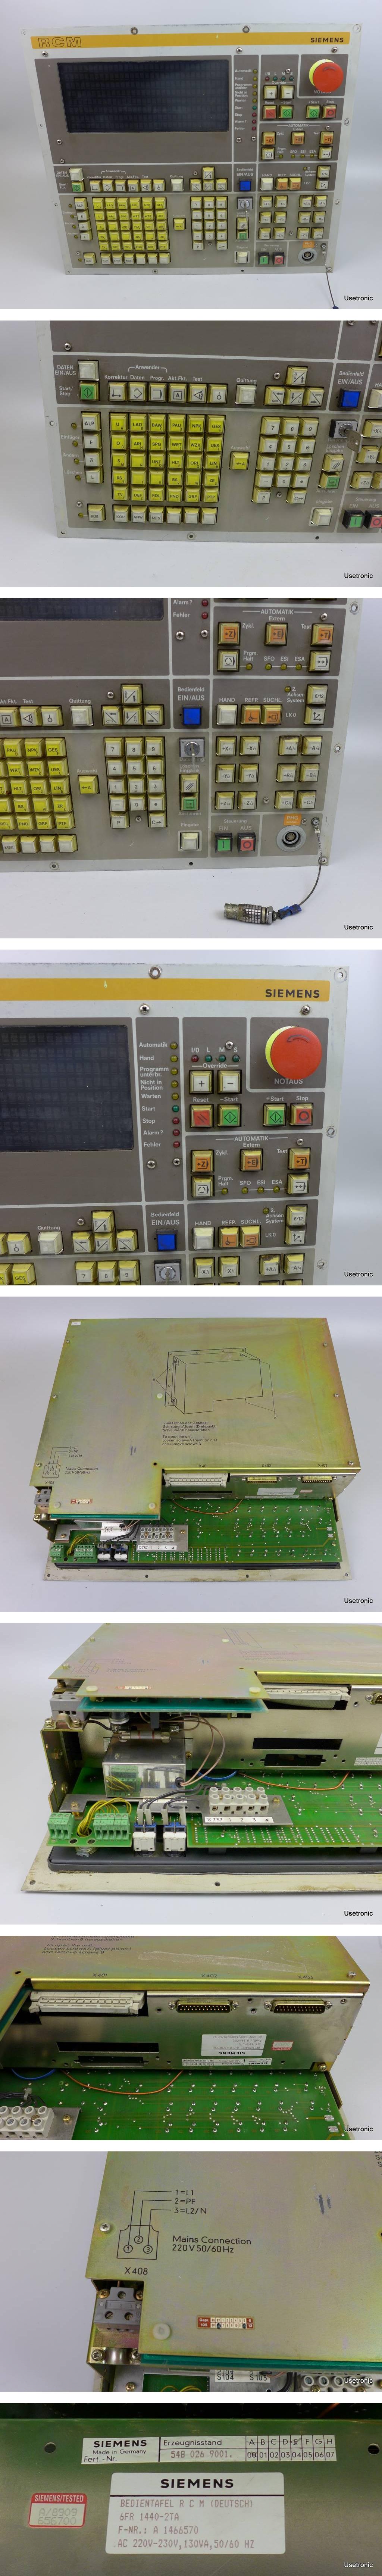 Siemens RCM 6FR1440-2TA